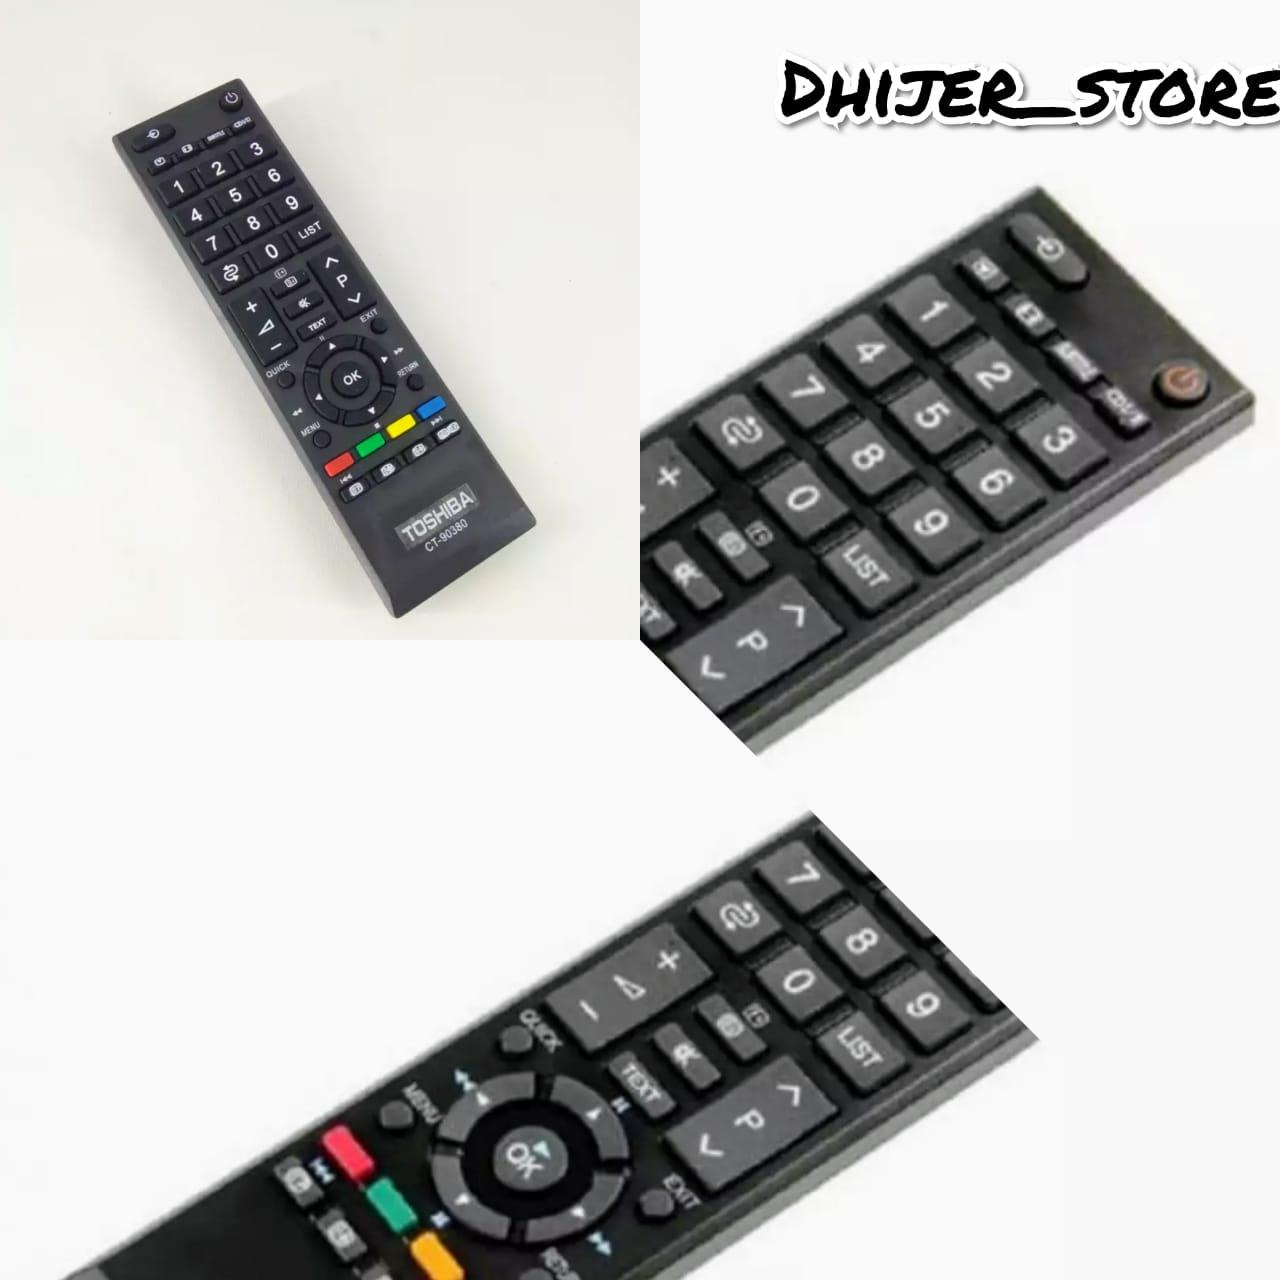 Remote TV Toshiba LCD LED - Toshiba Original Remote TV Dhijer_store